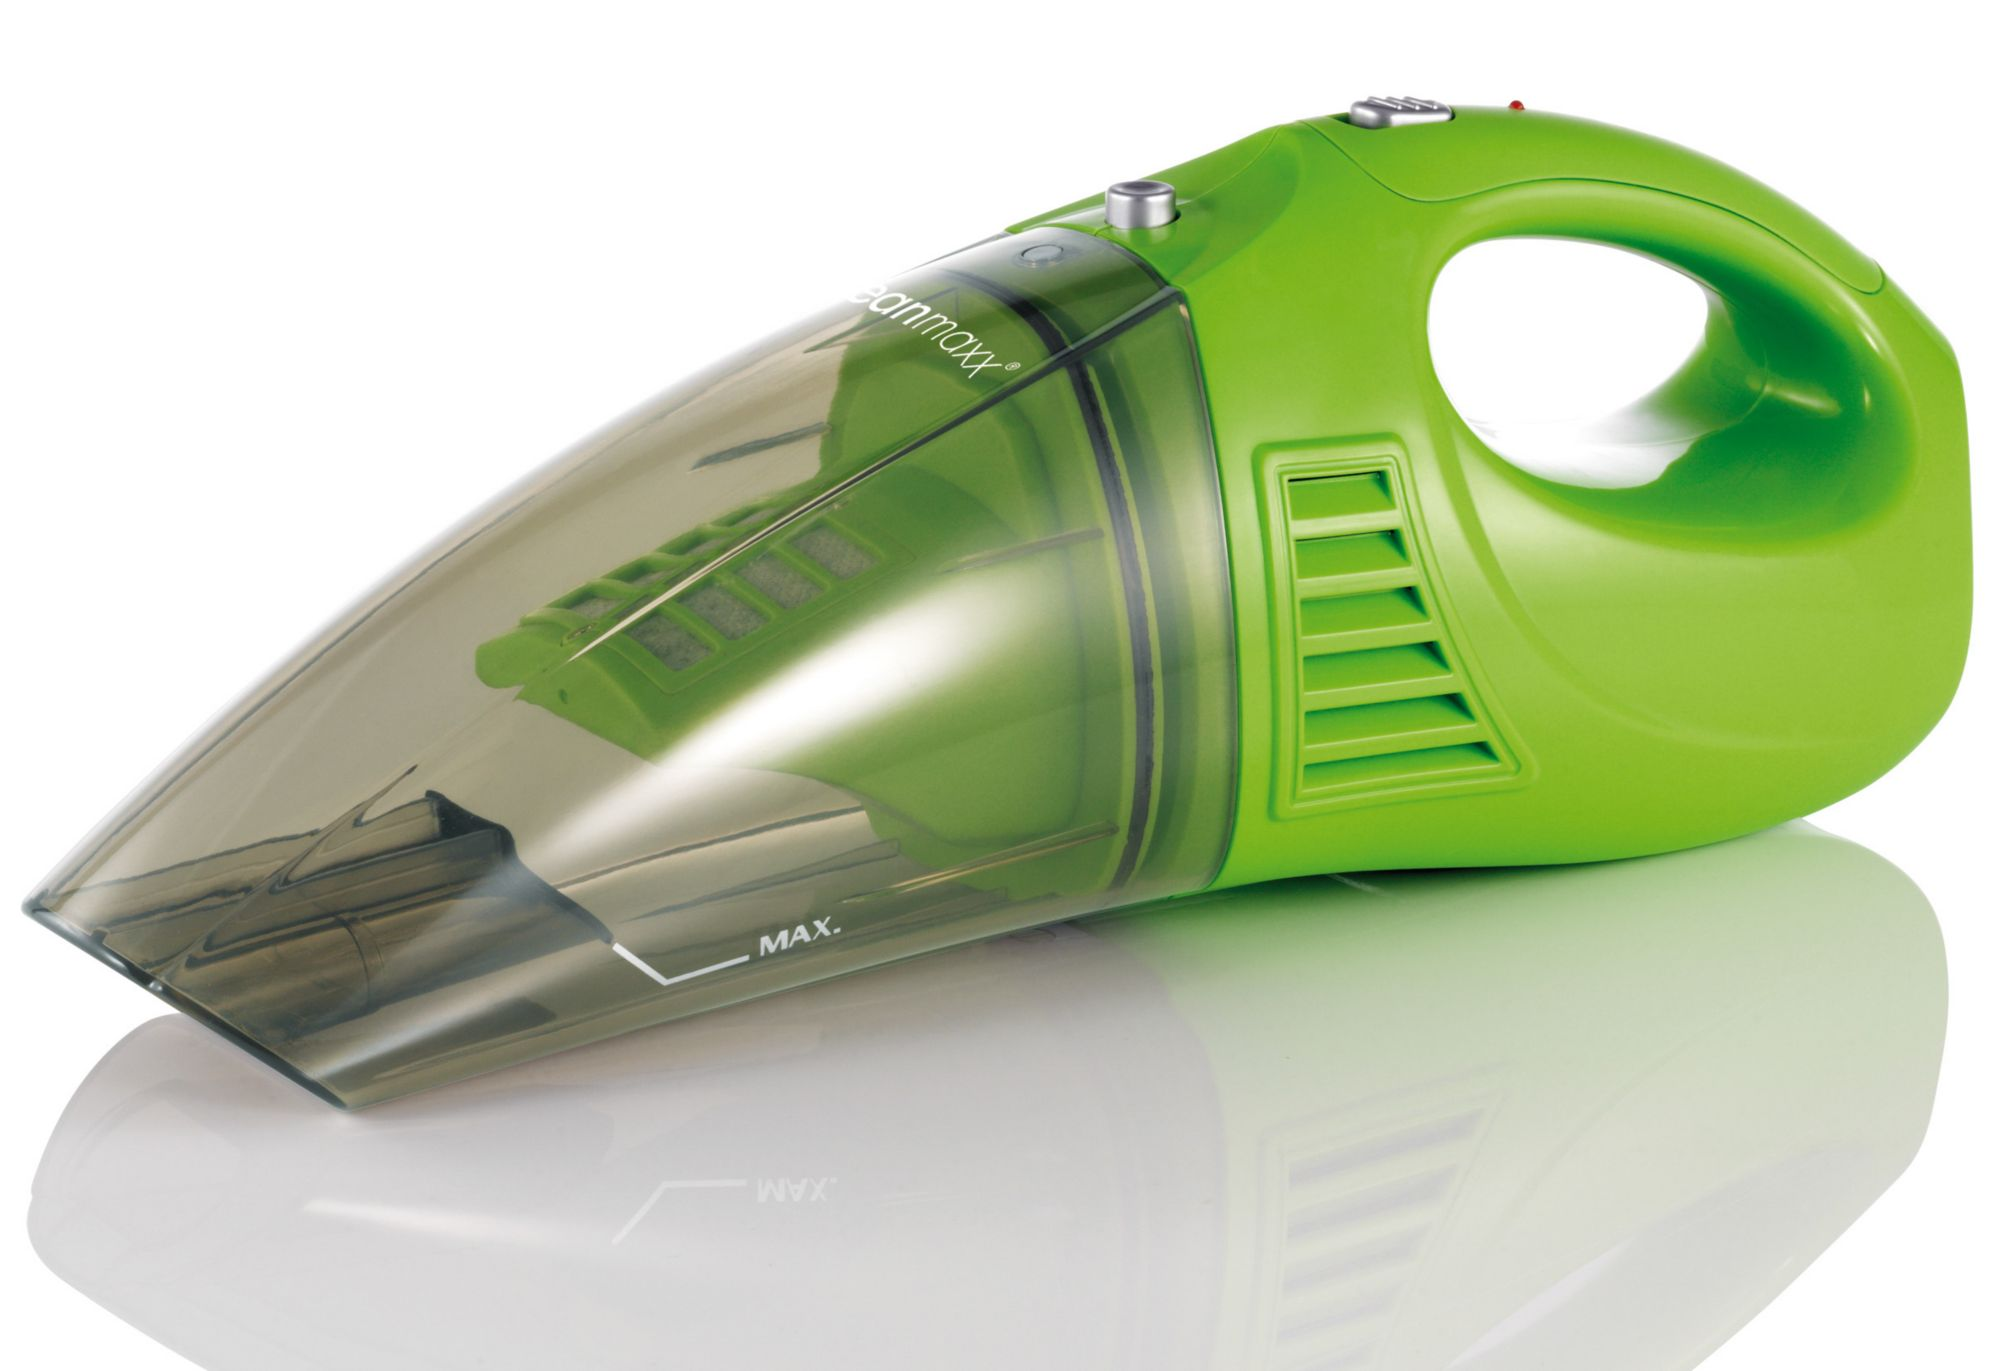 CLEAN MAXX cleanmaxx Akku-Handsauger Nass/Trocken Plus